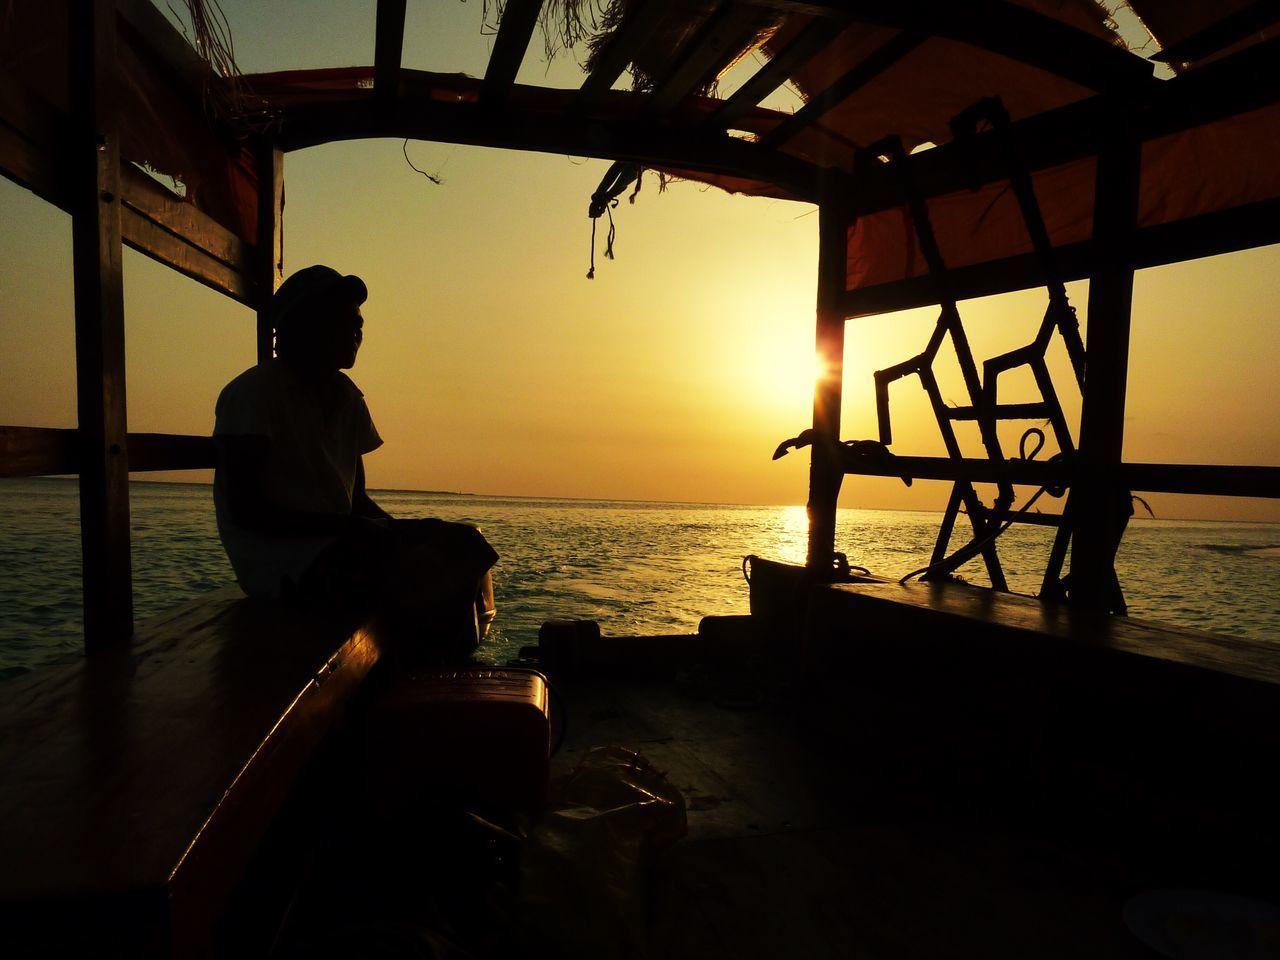 Man in boat at calm sea